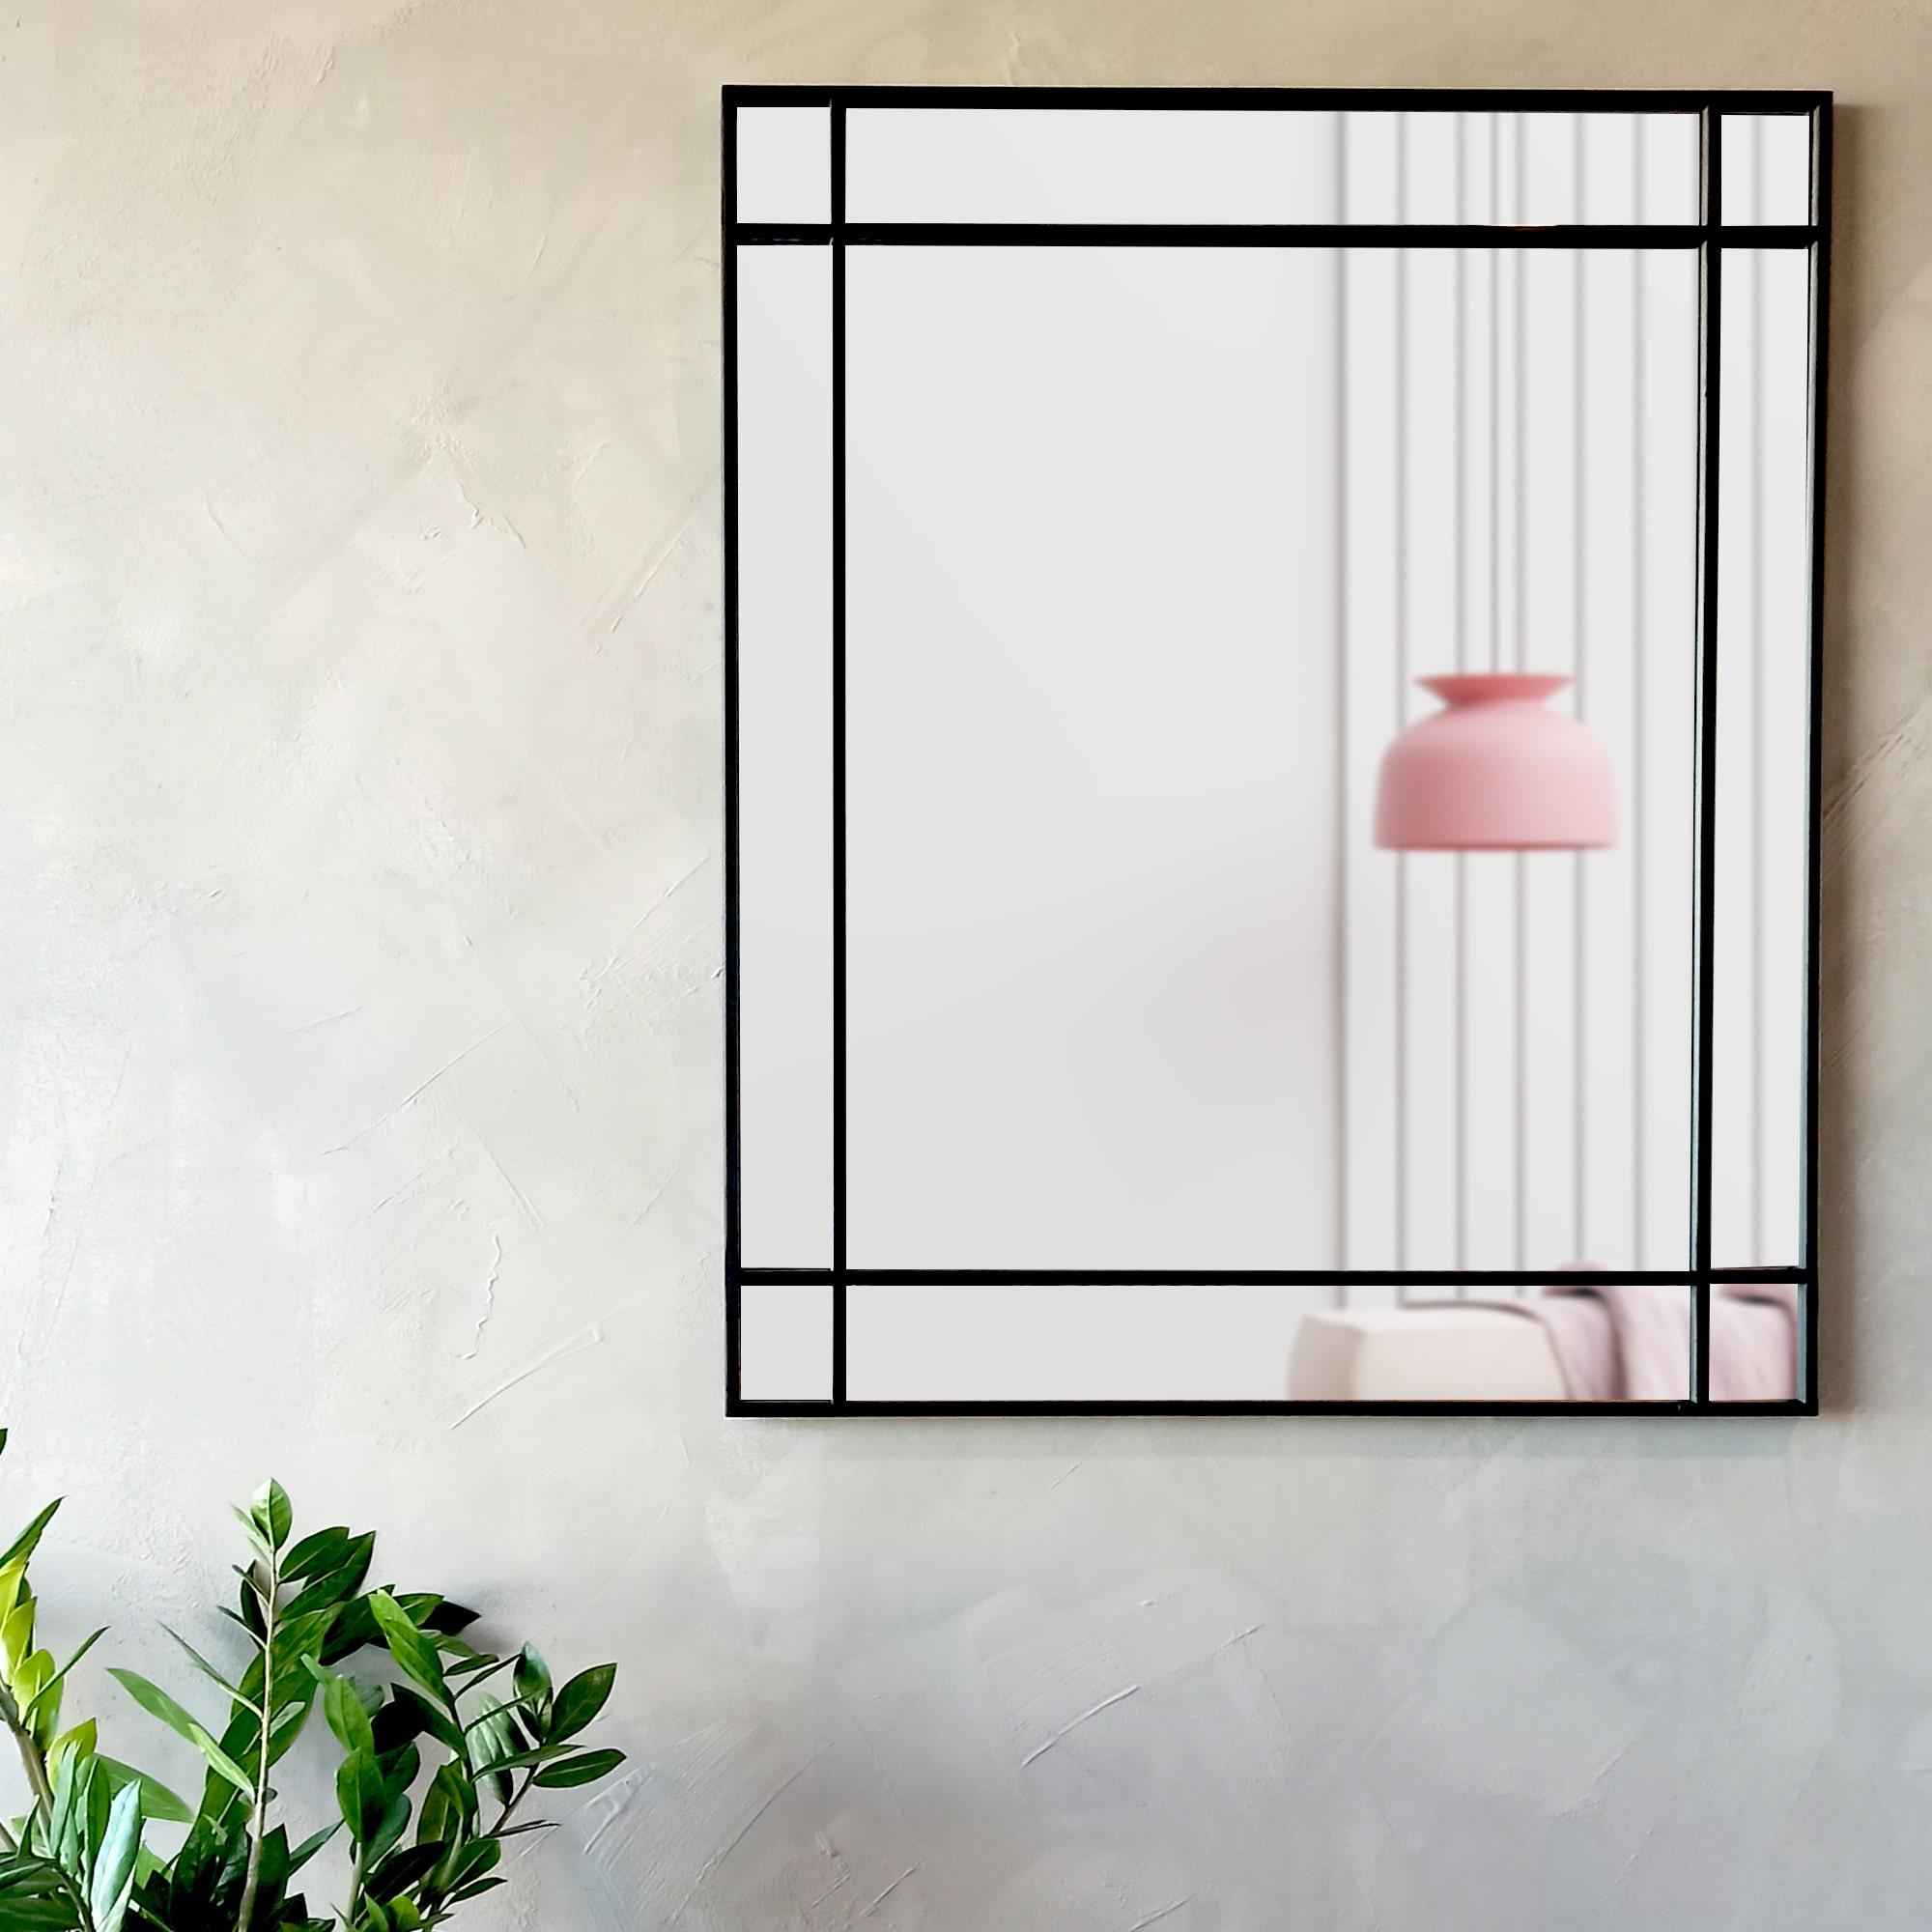 TepeHome - Tapasta Dekoratif Duvar Aynası Siyah